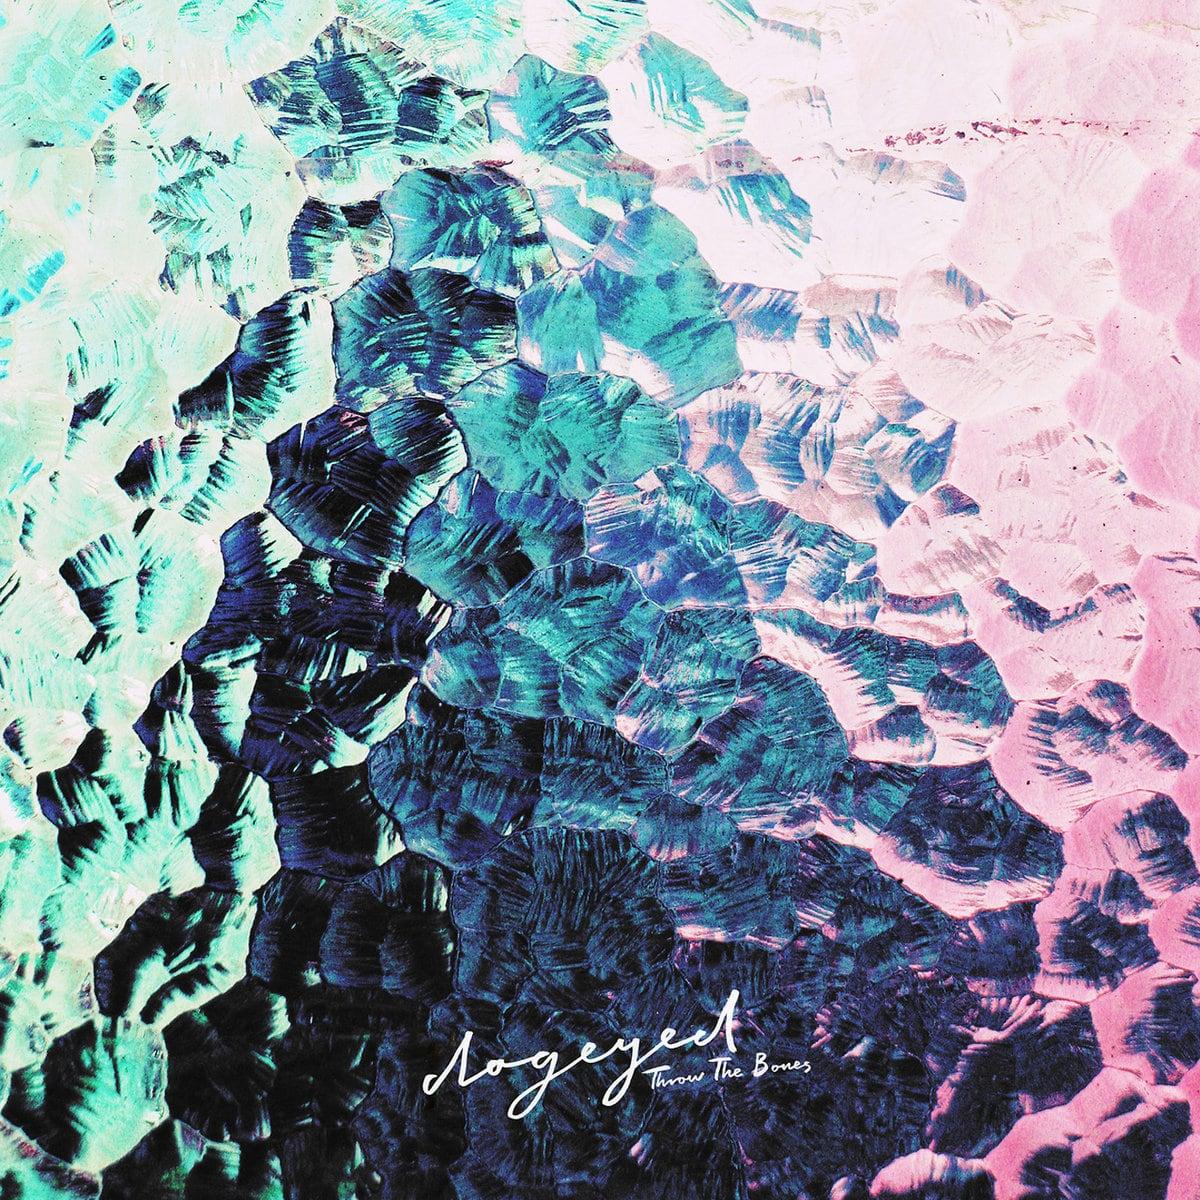 Dogeyed / Throw The Bones(300 Ltd 12inch EP)